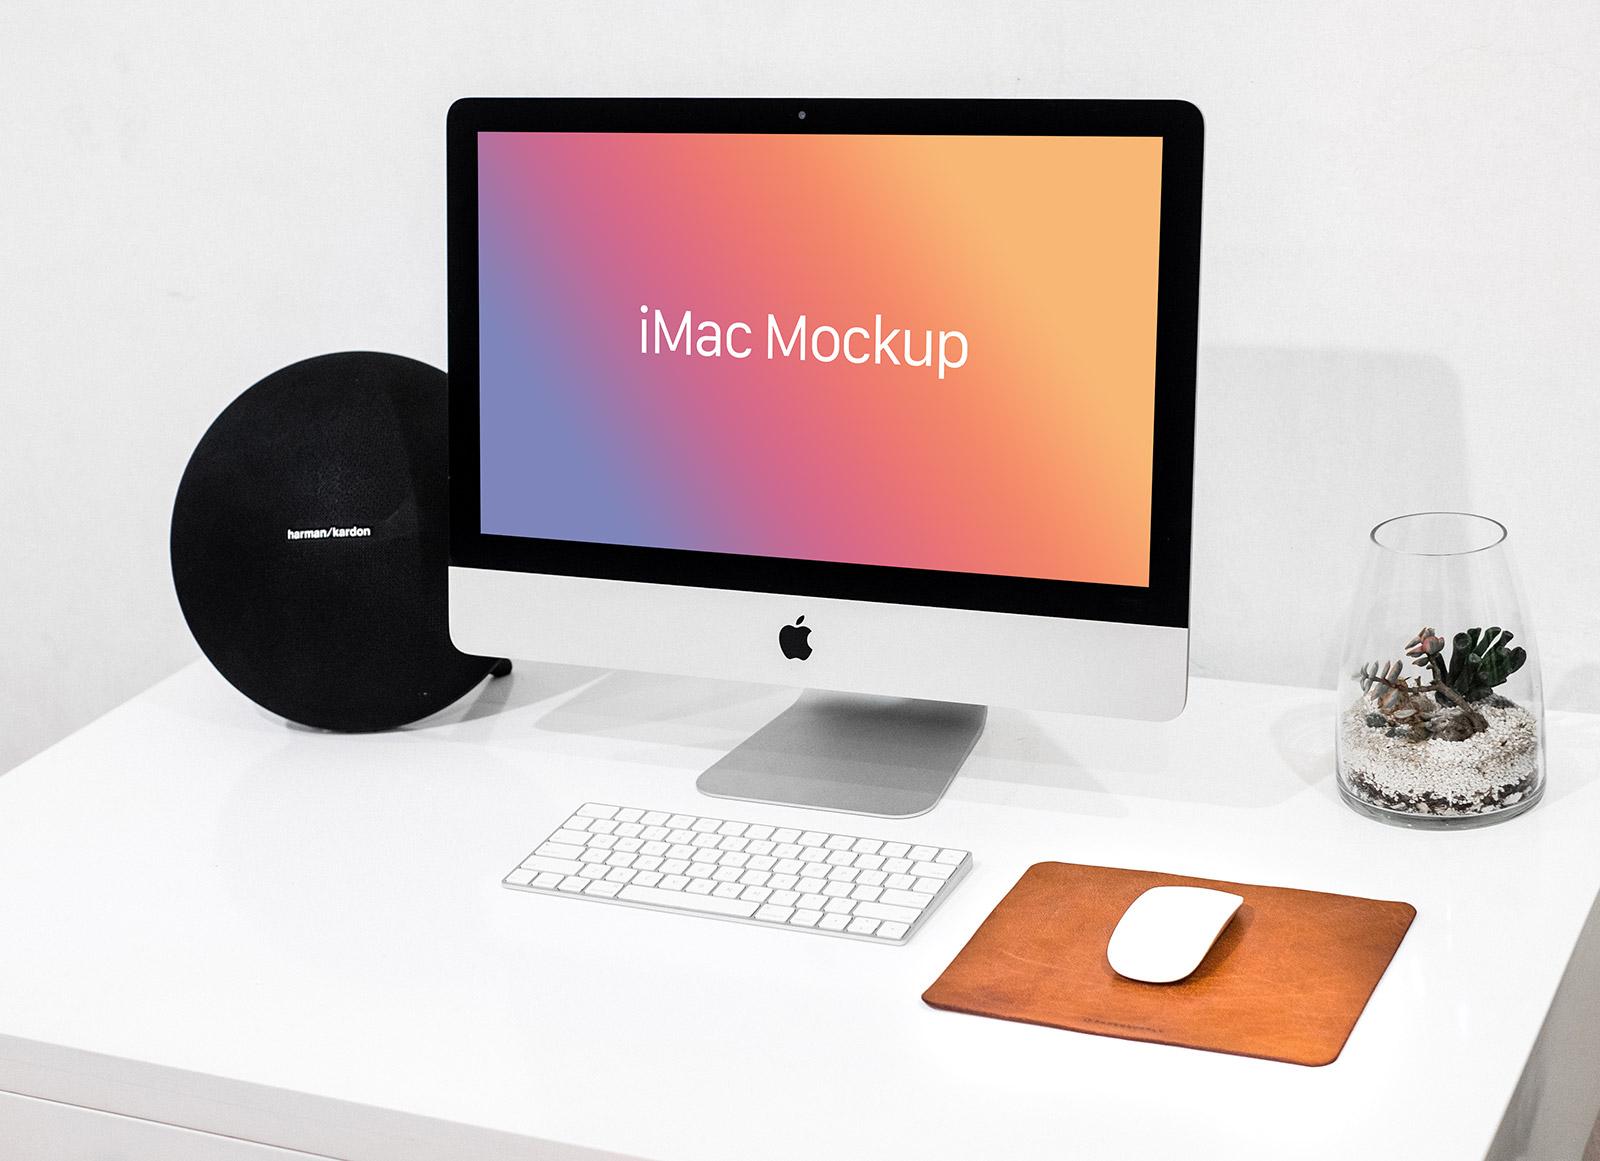 Free-Apple-iMac-Mockup-on-White-Desk